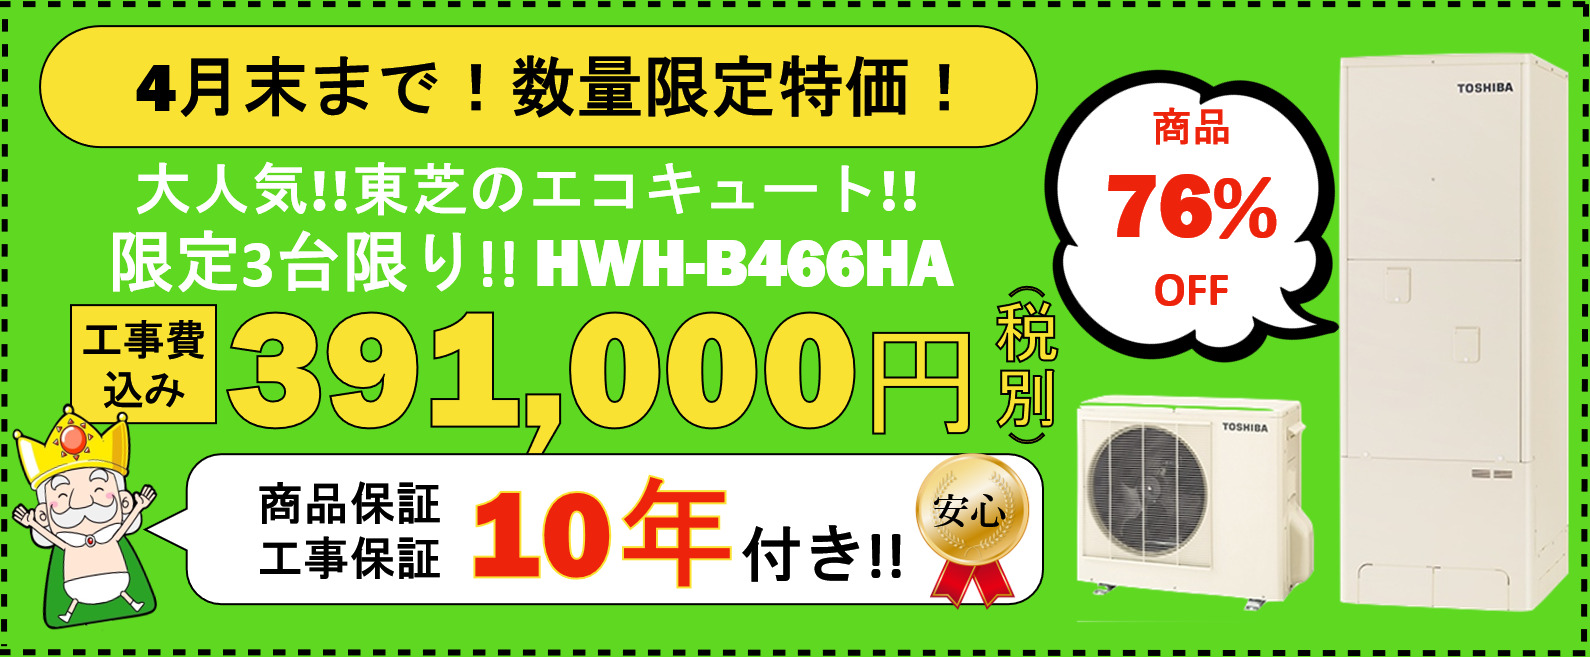 HWH-B466HA